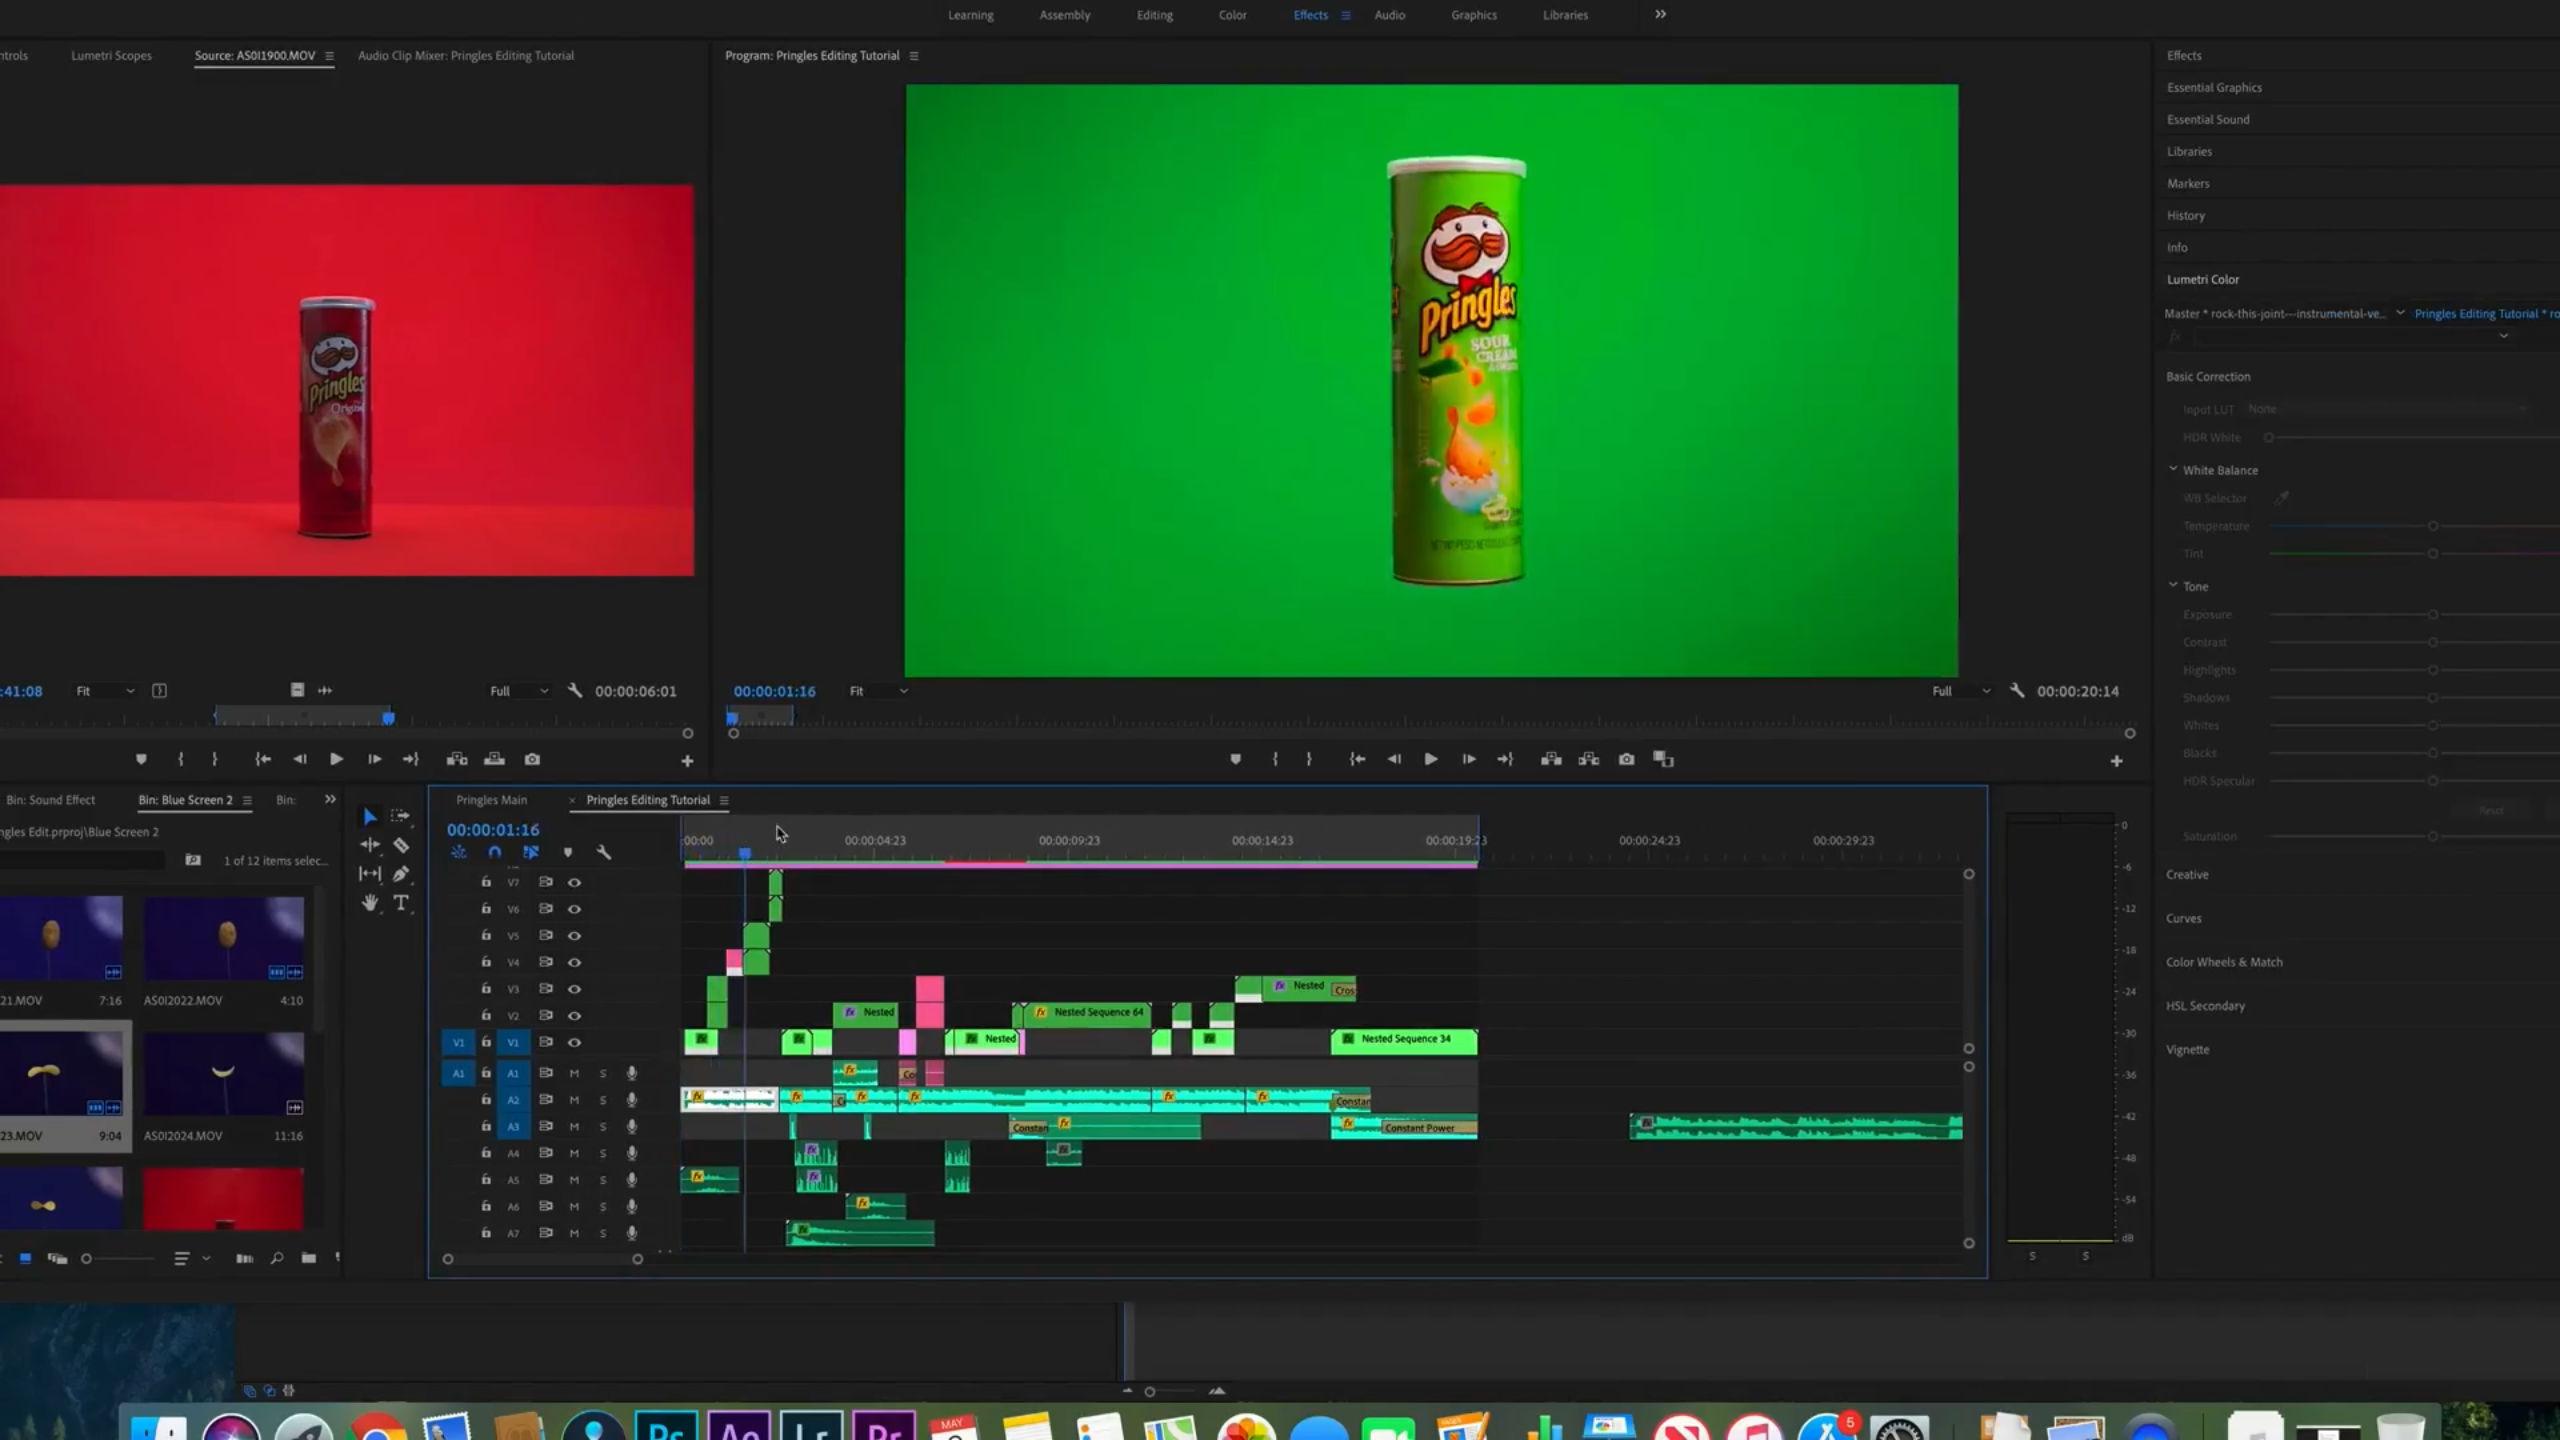 [VIDEO] How I Edited My Pringles Video